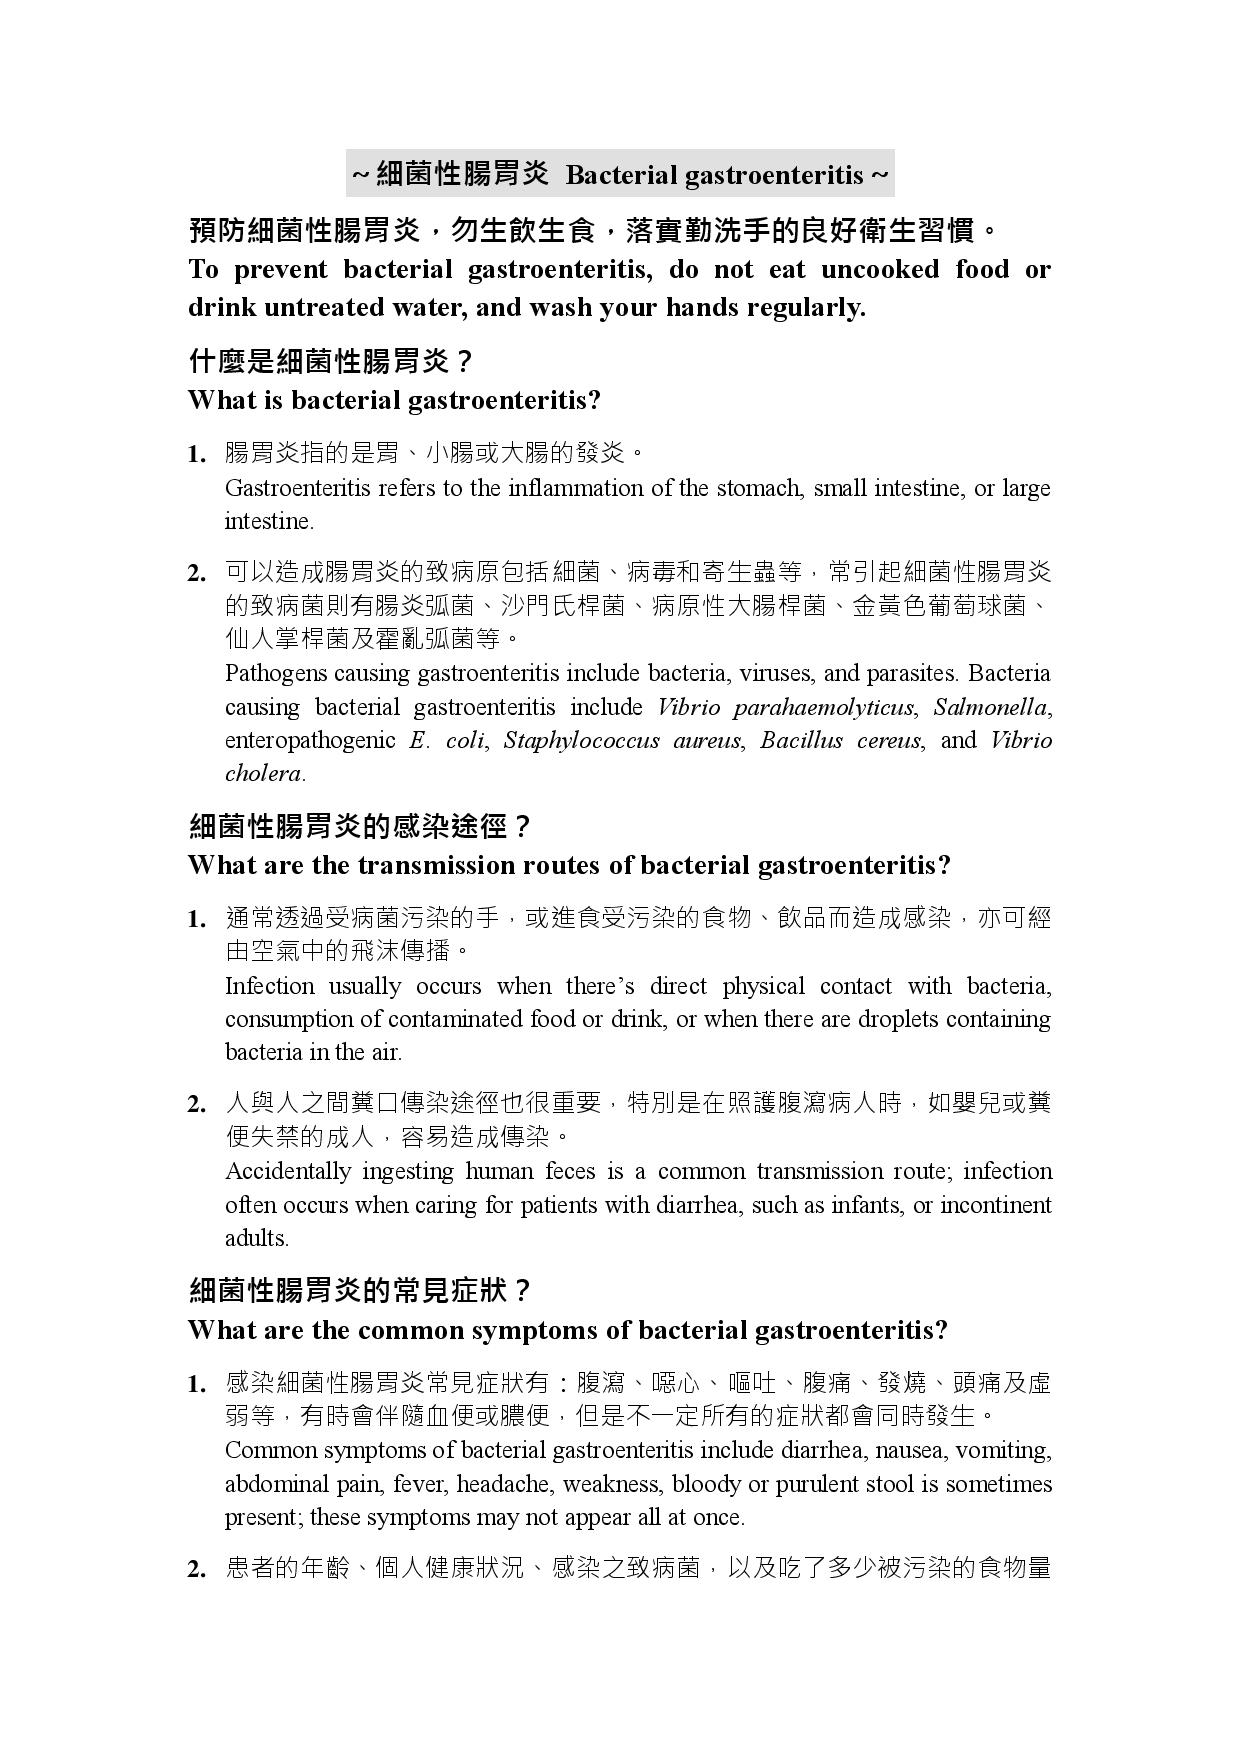 詳如附件【click me】To prevent bacterial gastroenteritis(Page 1)預防細菌性腸胃炎(英文)